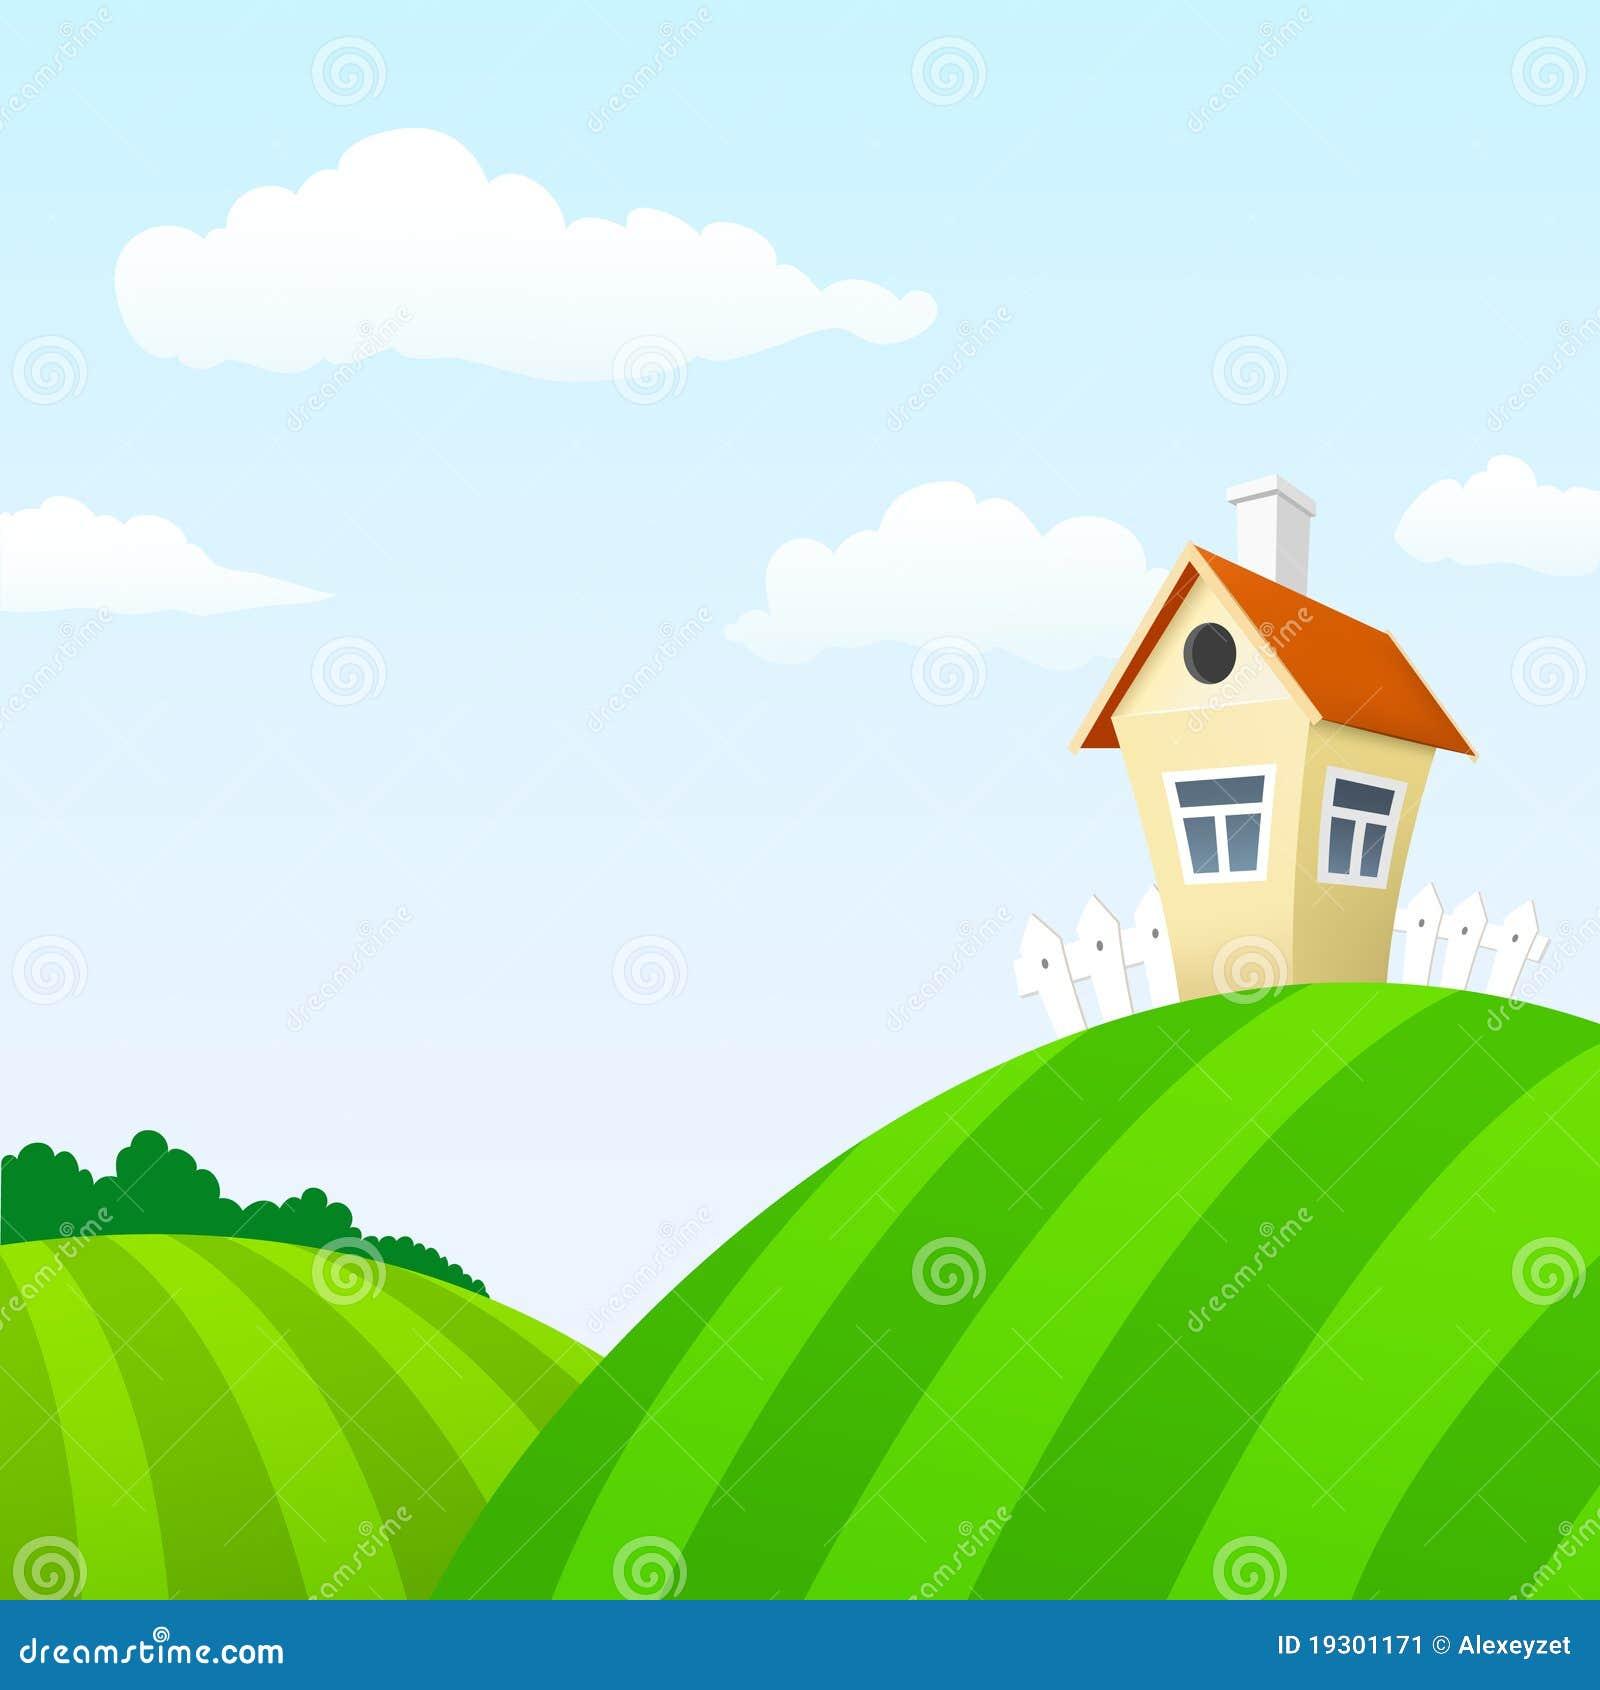 House Landscape Images: Cartoon Nature Landscape With House Stock Image